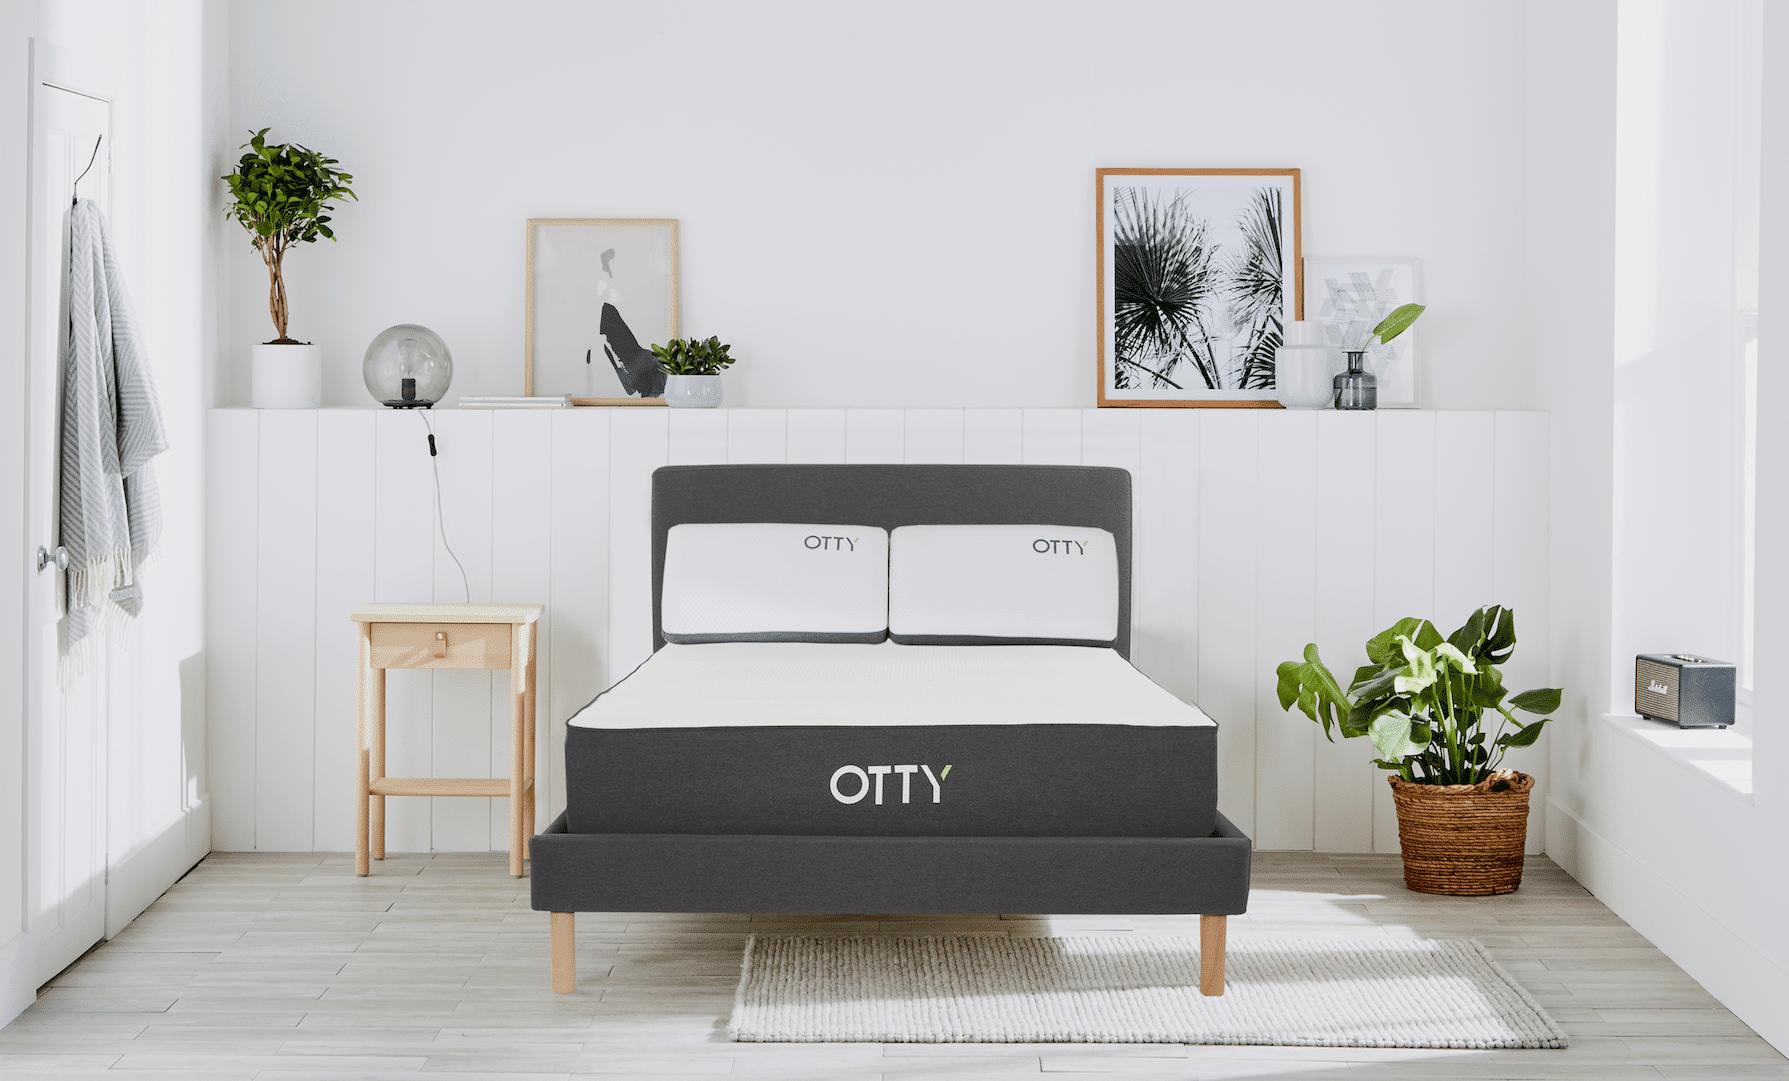 OTTY Sleep OTTY Hybrid Mattress, Bed Frame & Deluxe Pillows, Single   W90 L190 H25 cm